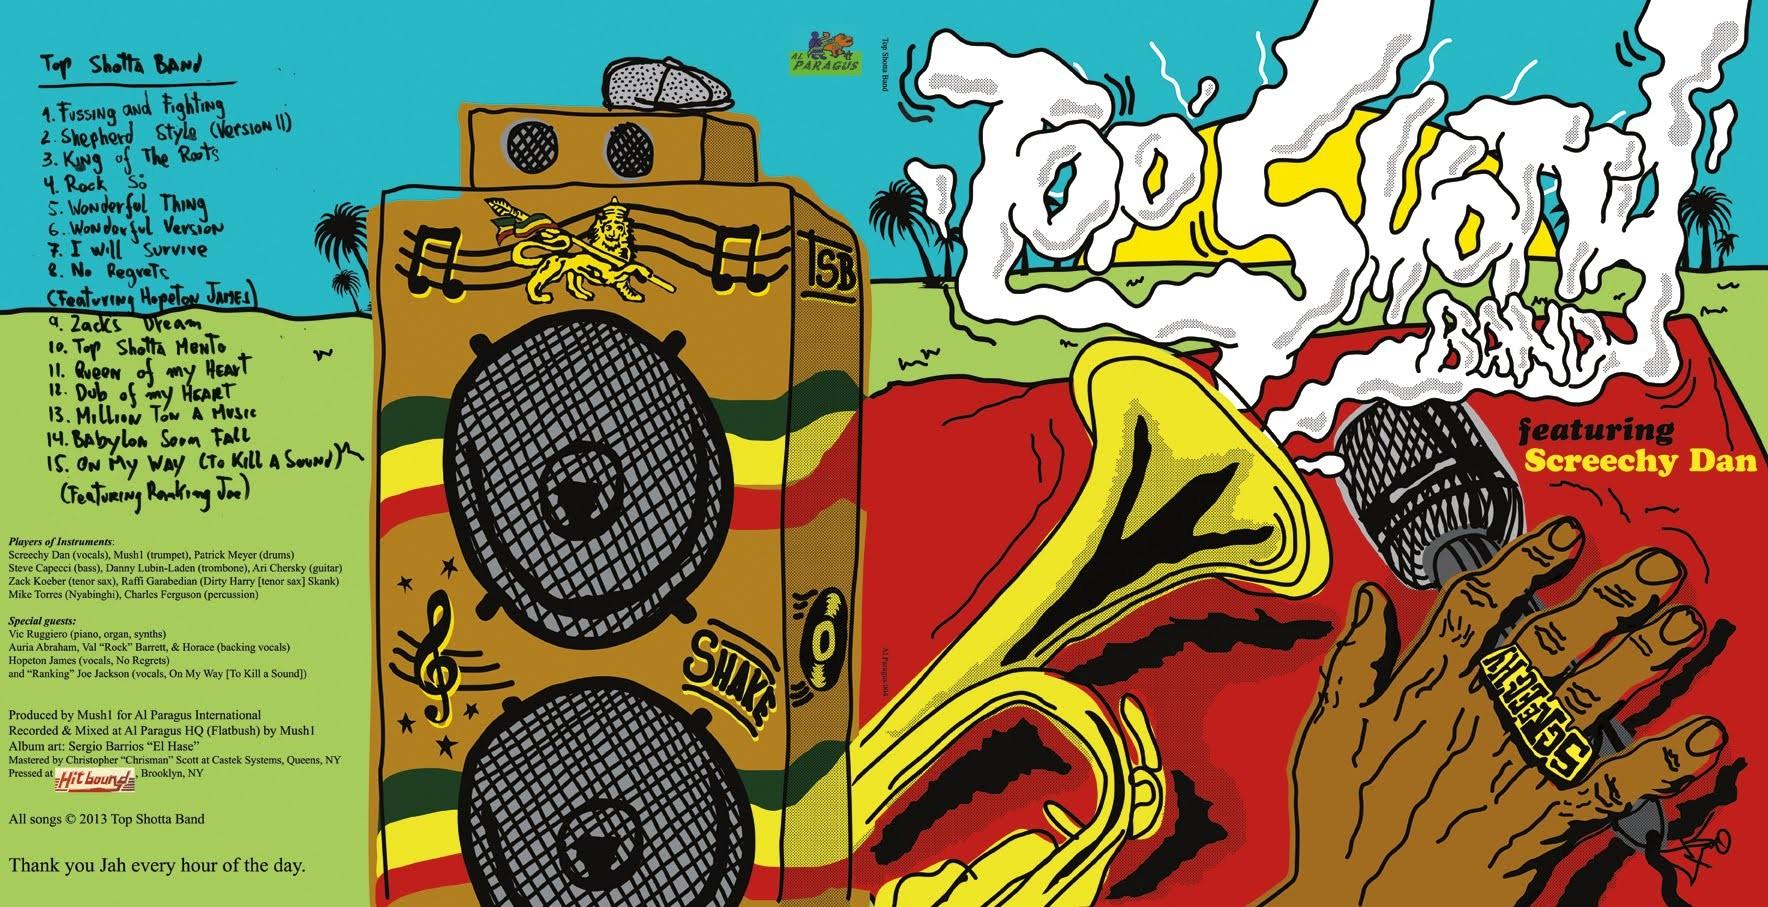 Top Shota Band : Featuring Screechy Dan | LP / 33T  |  Dancehall / Nu-roots